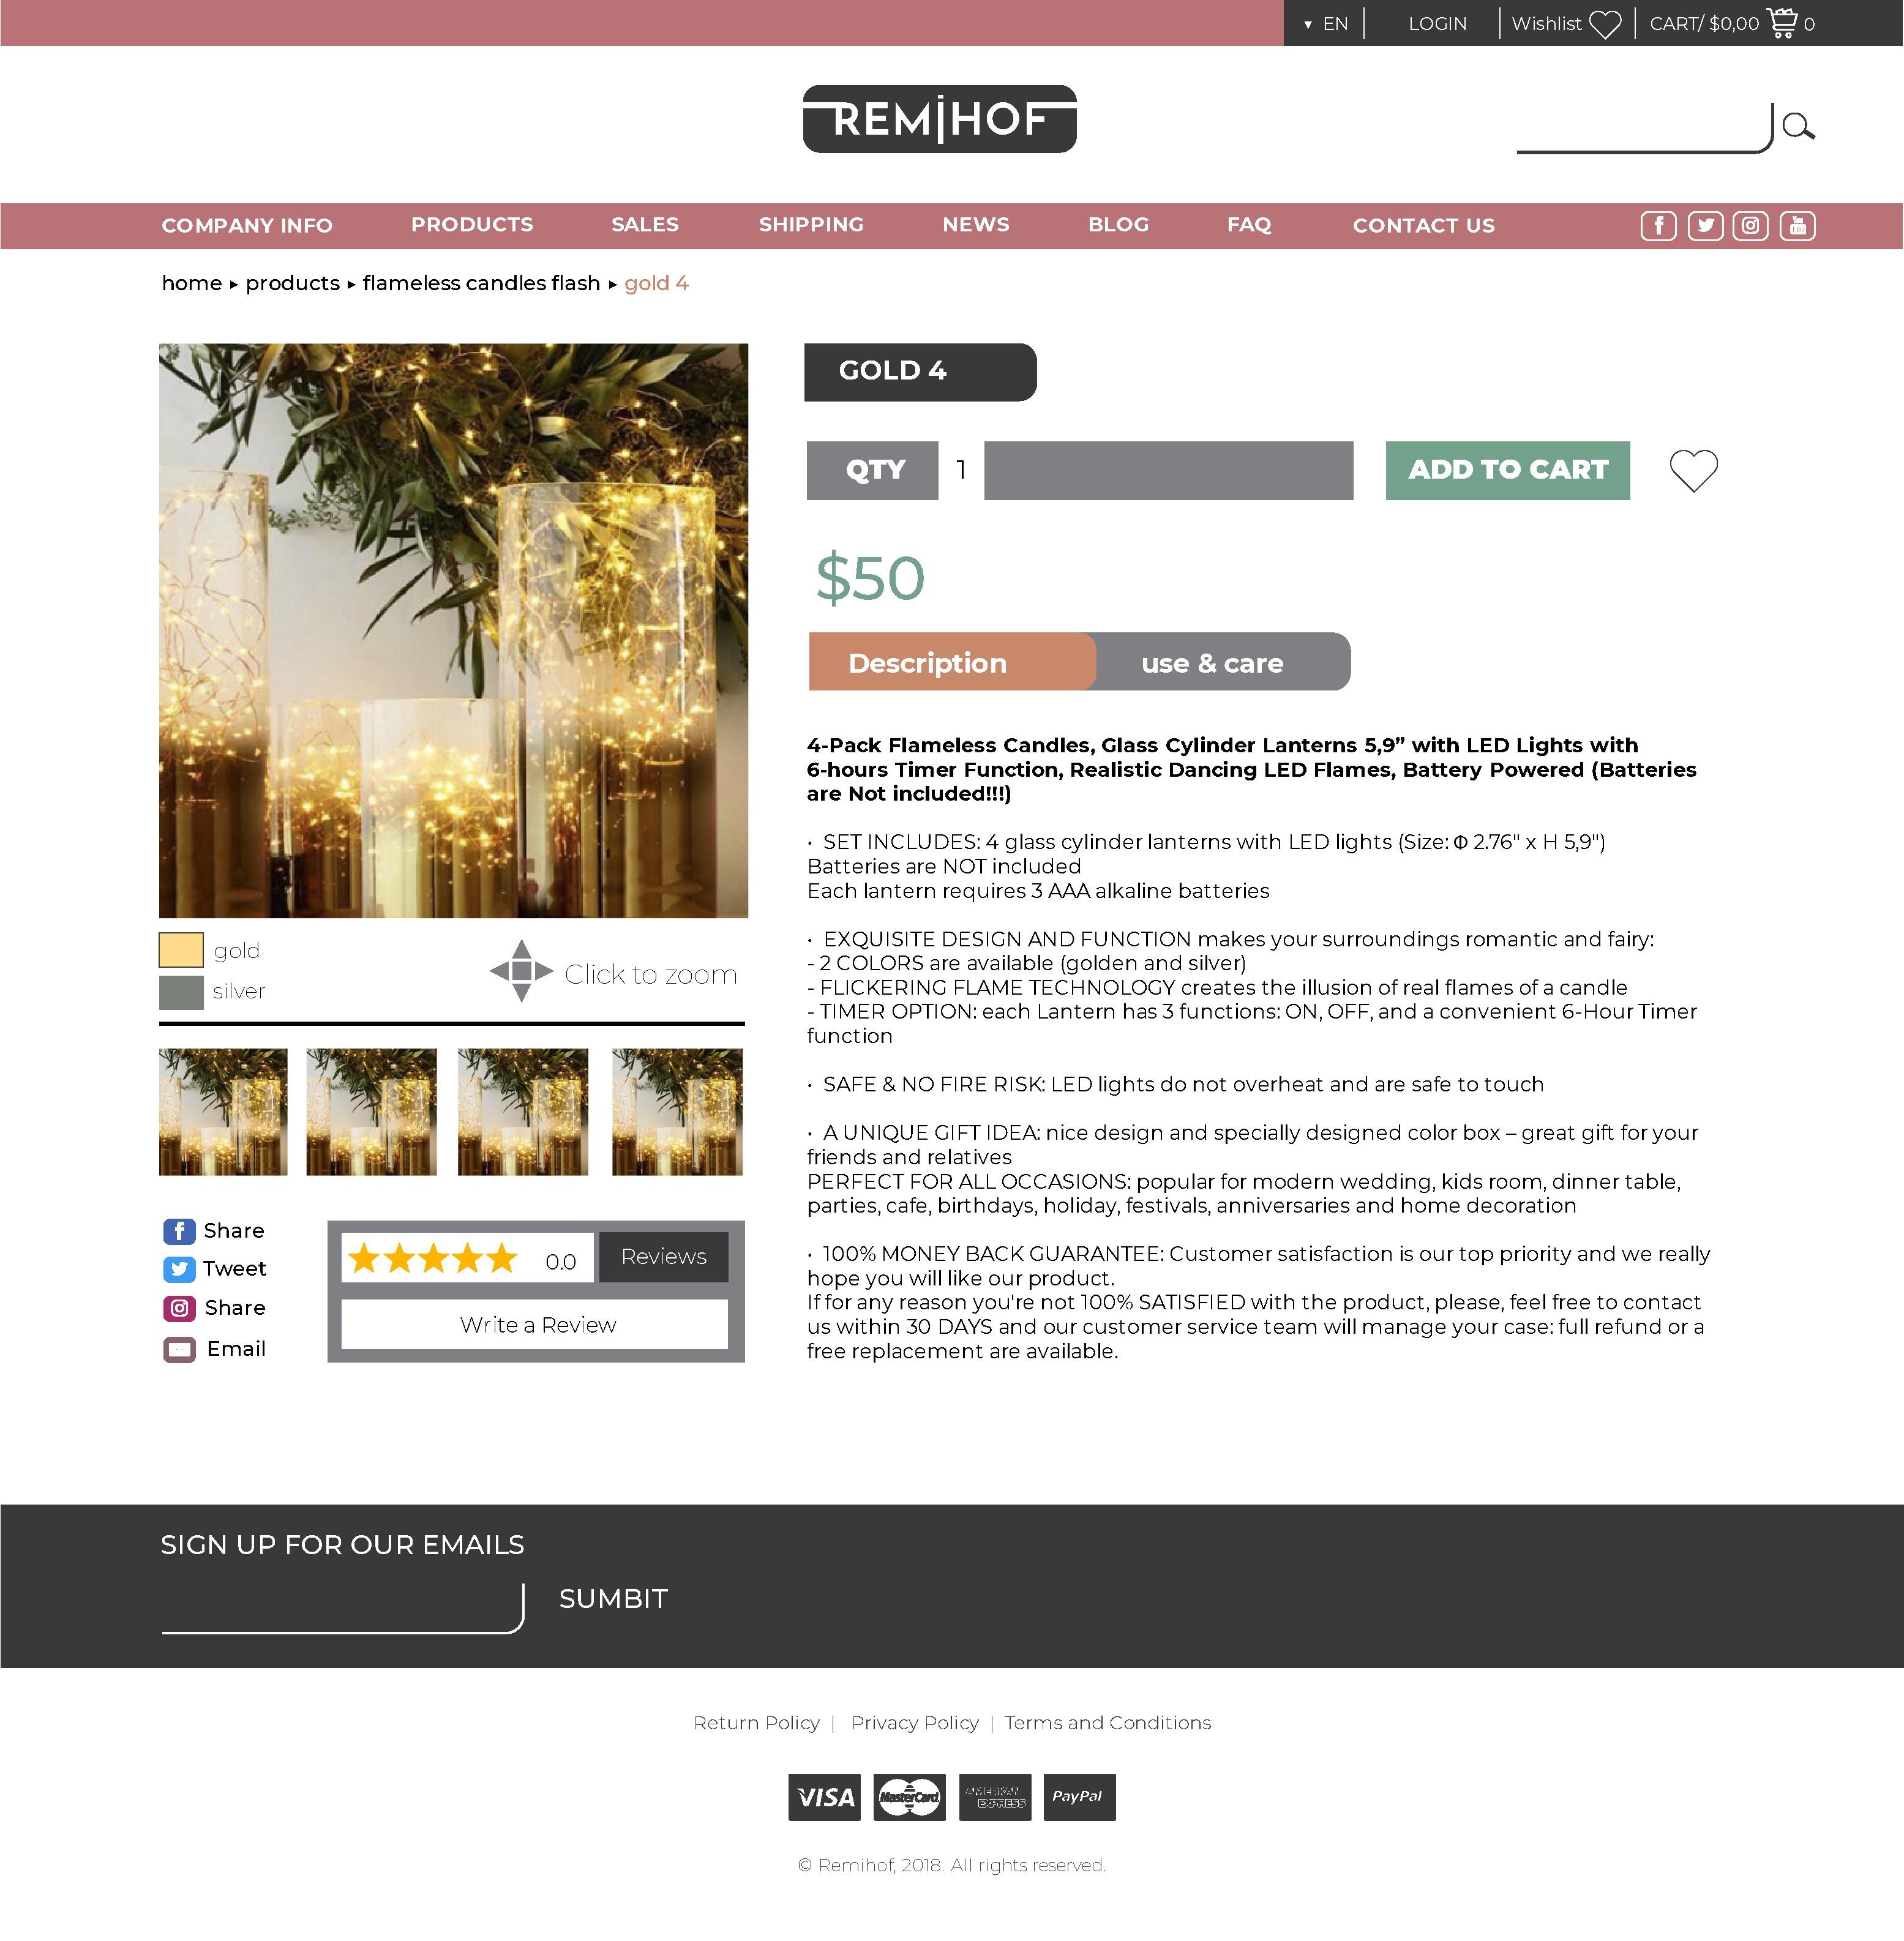 Remihof Amazon Saling  Web Project